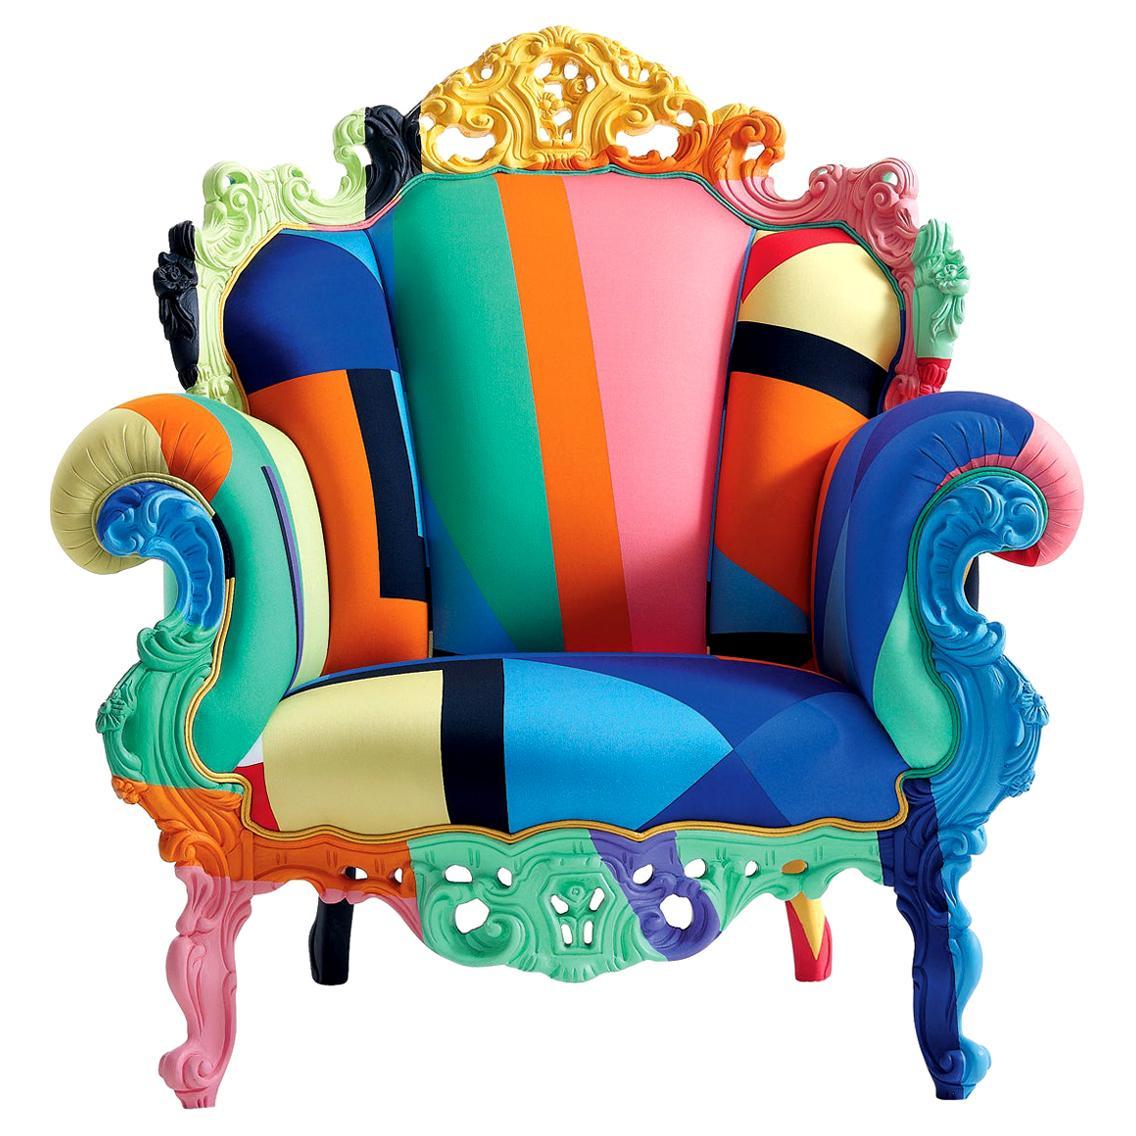 Alessandro Mendini Proust Geometrica Armchair in Multi-Color Fabric, Cappellini